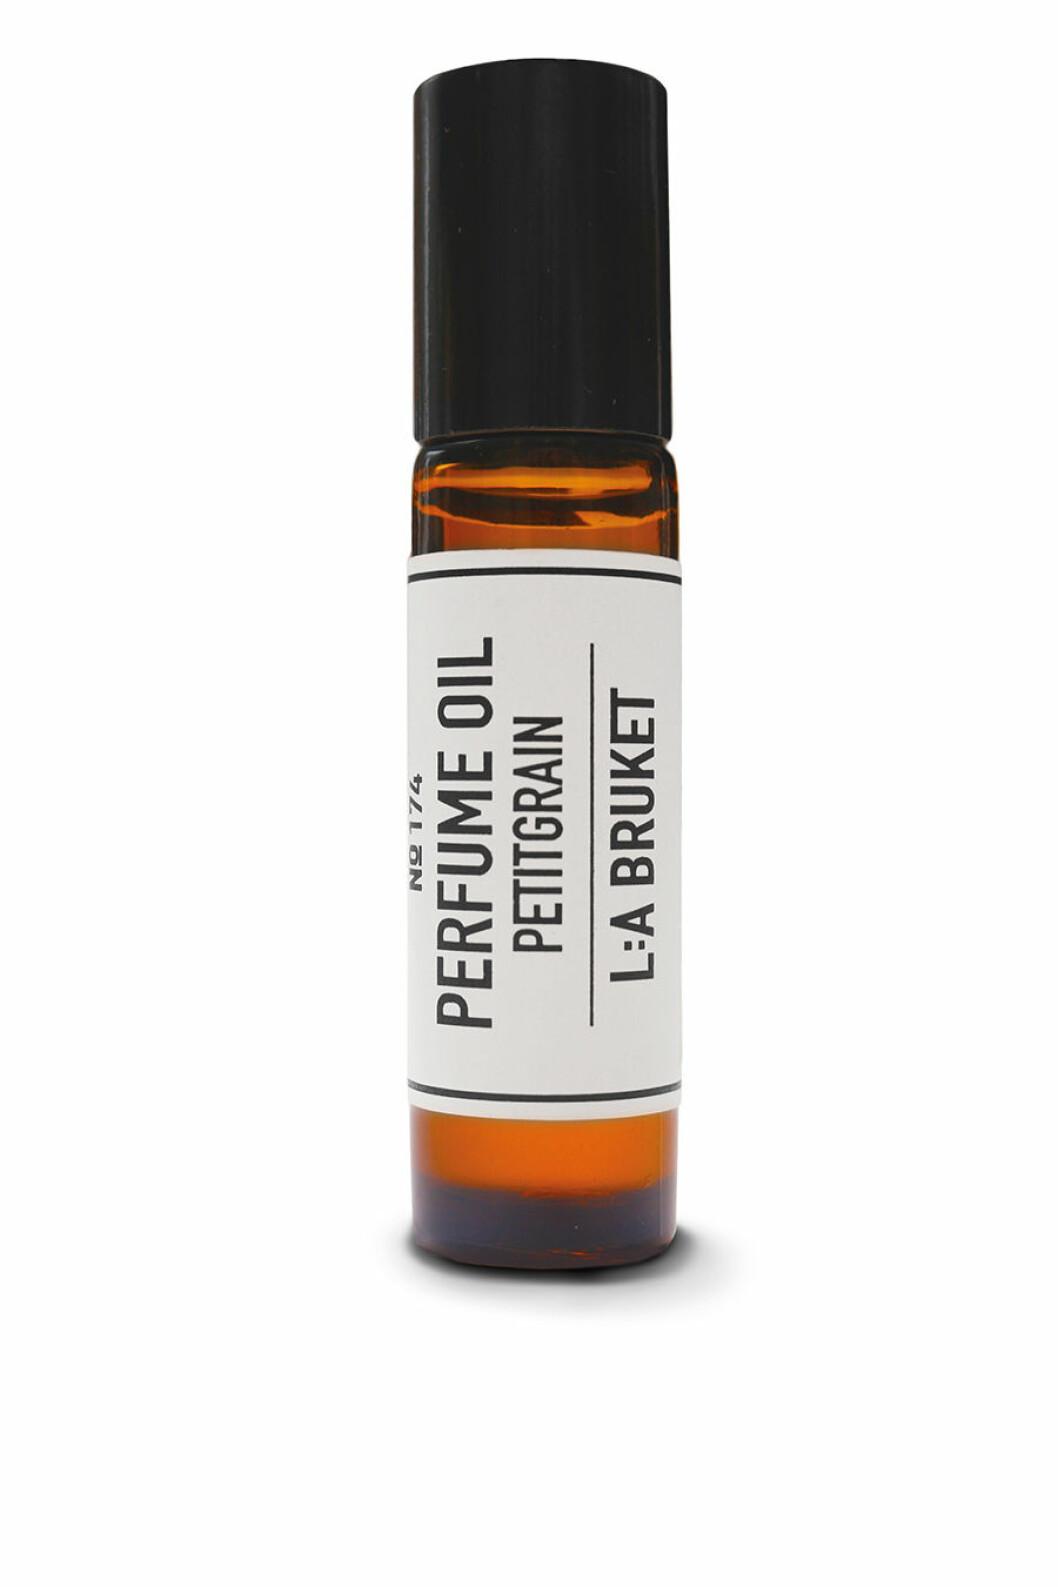 l_a-bruket_174-perfume-oil-petitgrain-10-ml_perfumes_art-no-10984_459-sek_51-eur_material-_size-10ml